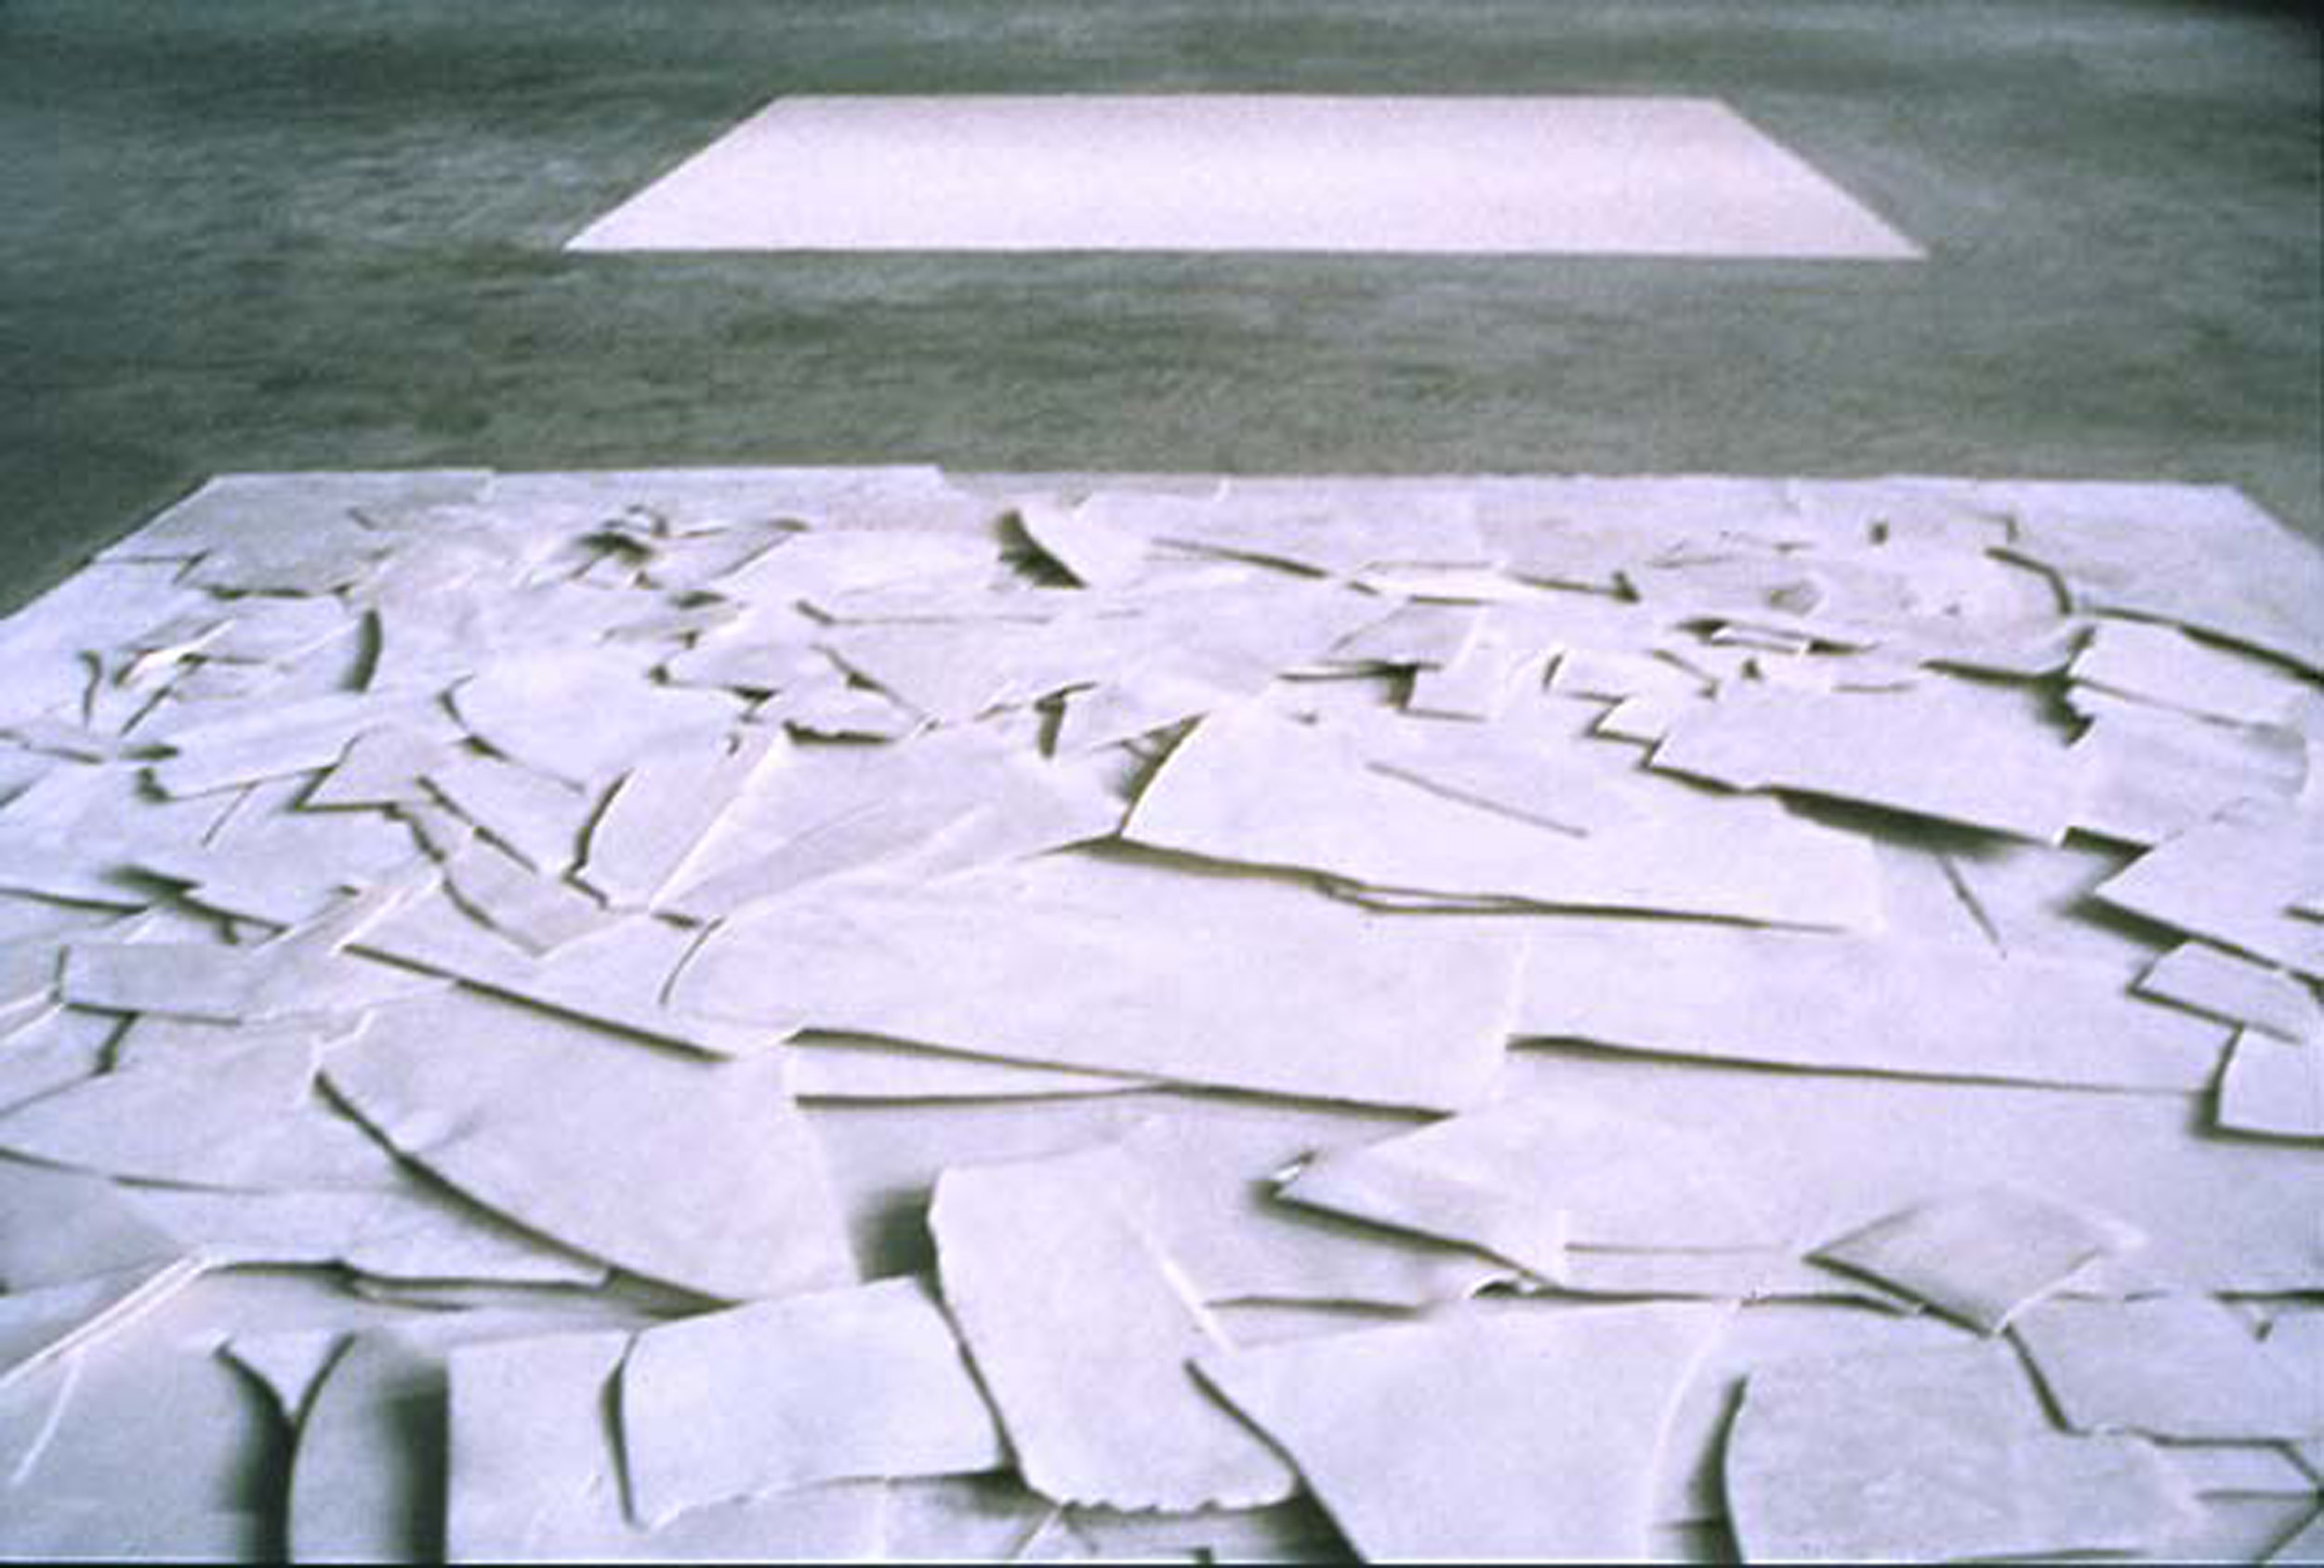 Shard Square Installation (detail)1997  Europees Keramisch Workcentrum, s'Hertogenbosch, NL  Porcelain, dimensions variable